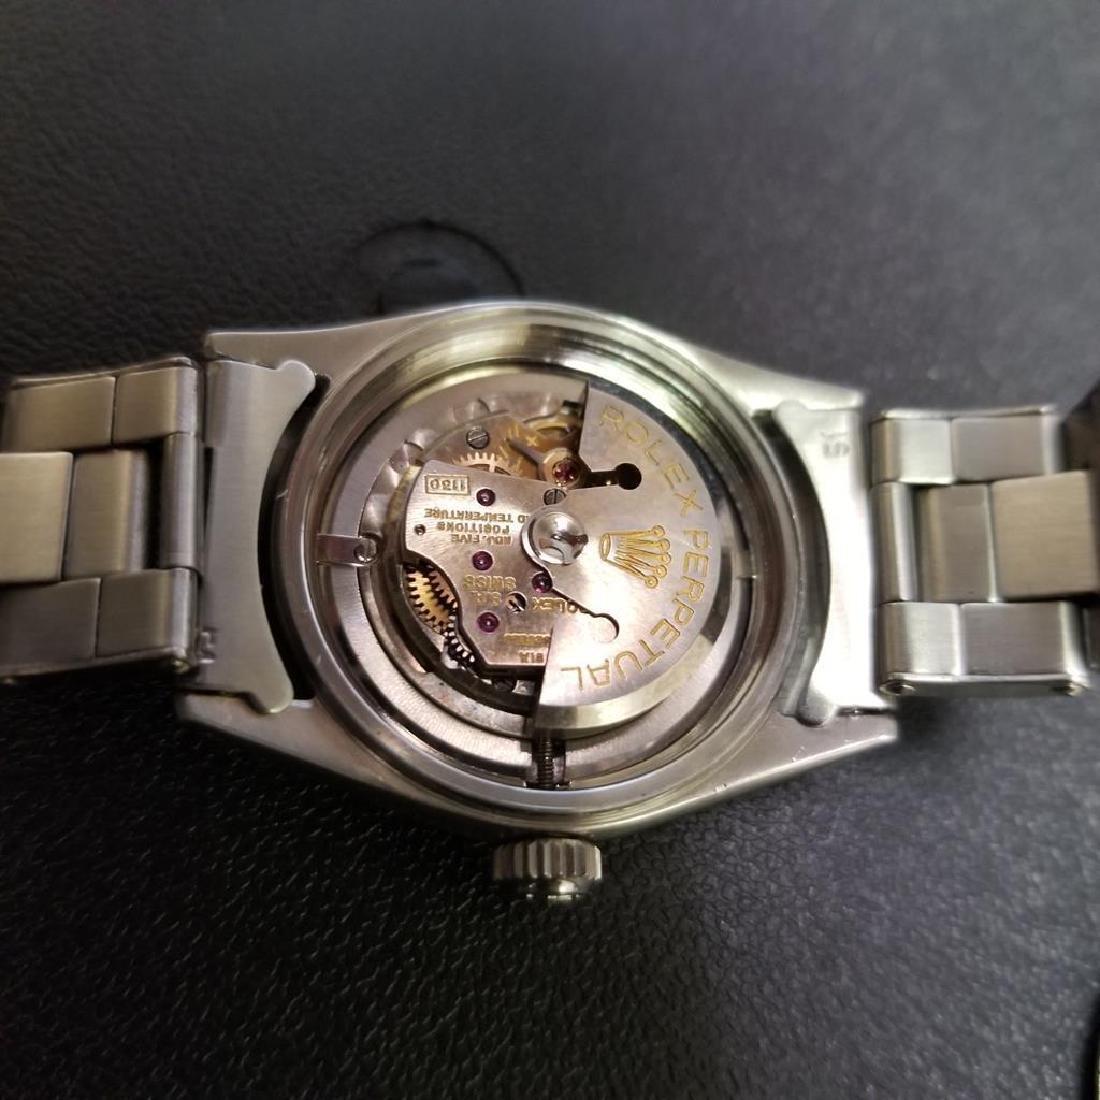 ROLEX Men's Midsize Rolex Oyster Perpetual 6549 - 9